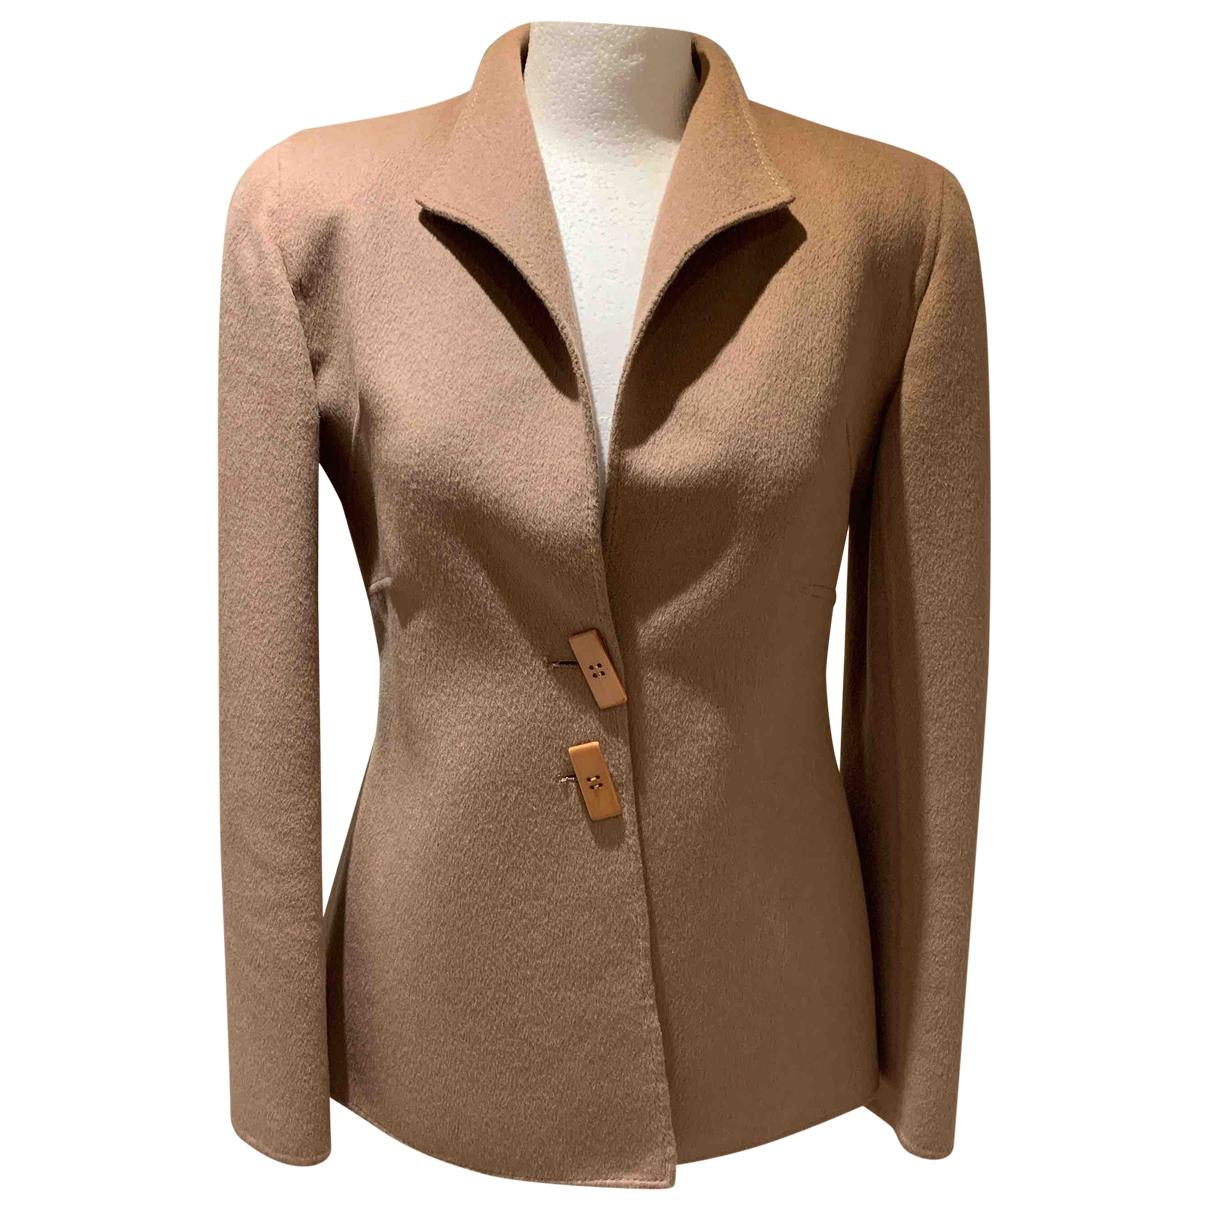 Valentino Garavani \N Beige Wool jacket for Women 10 US